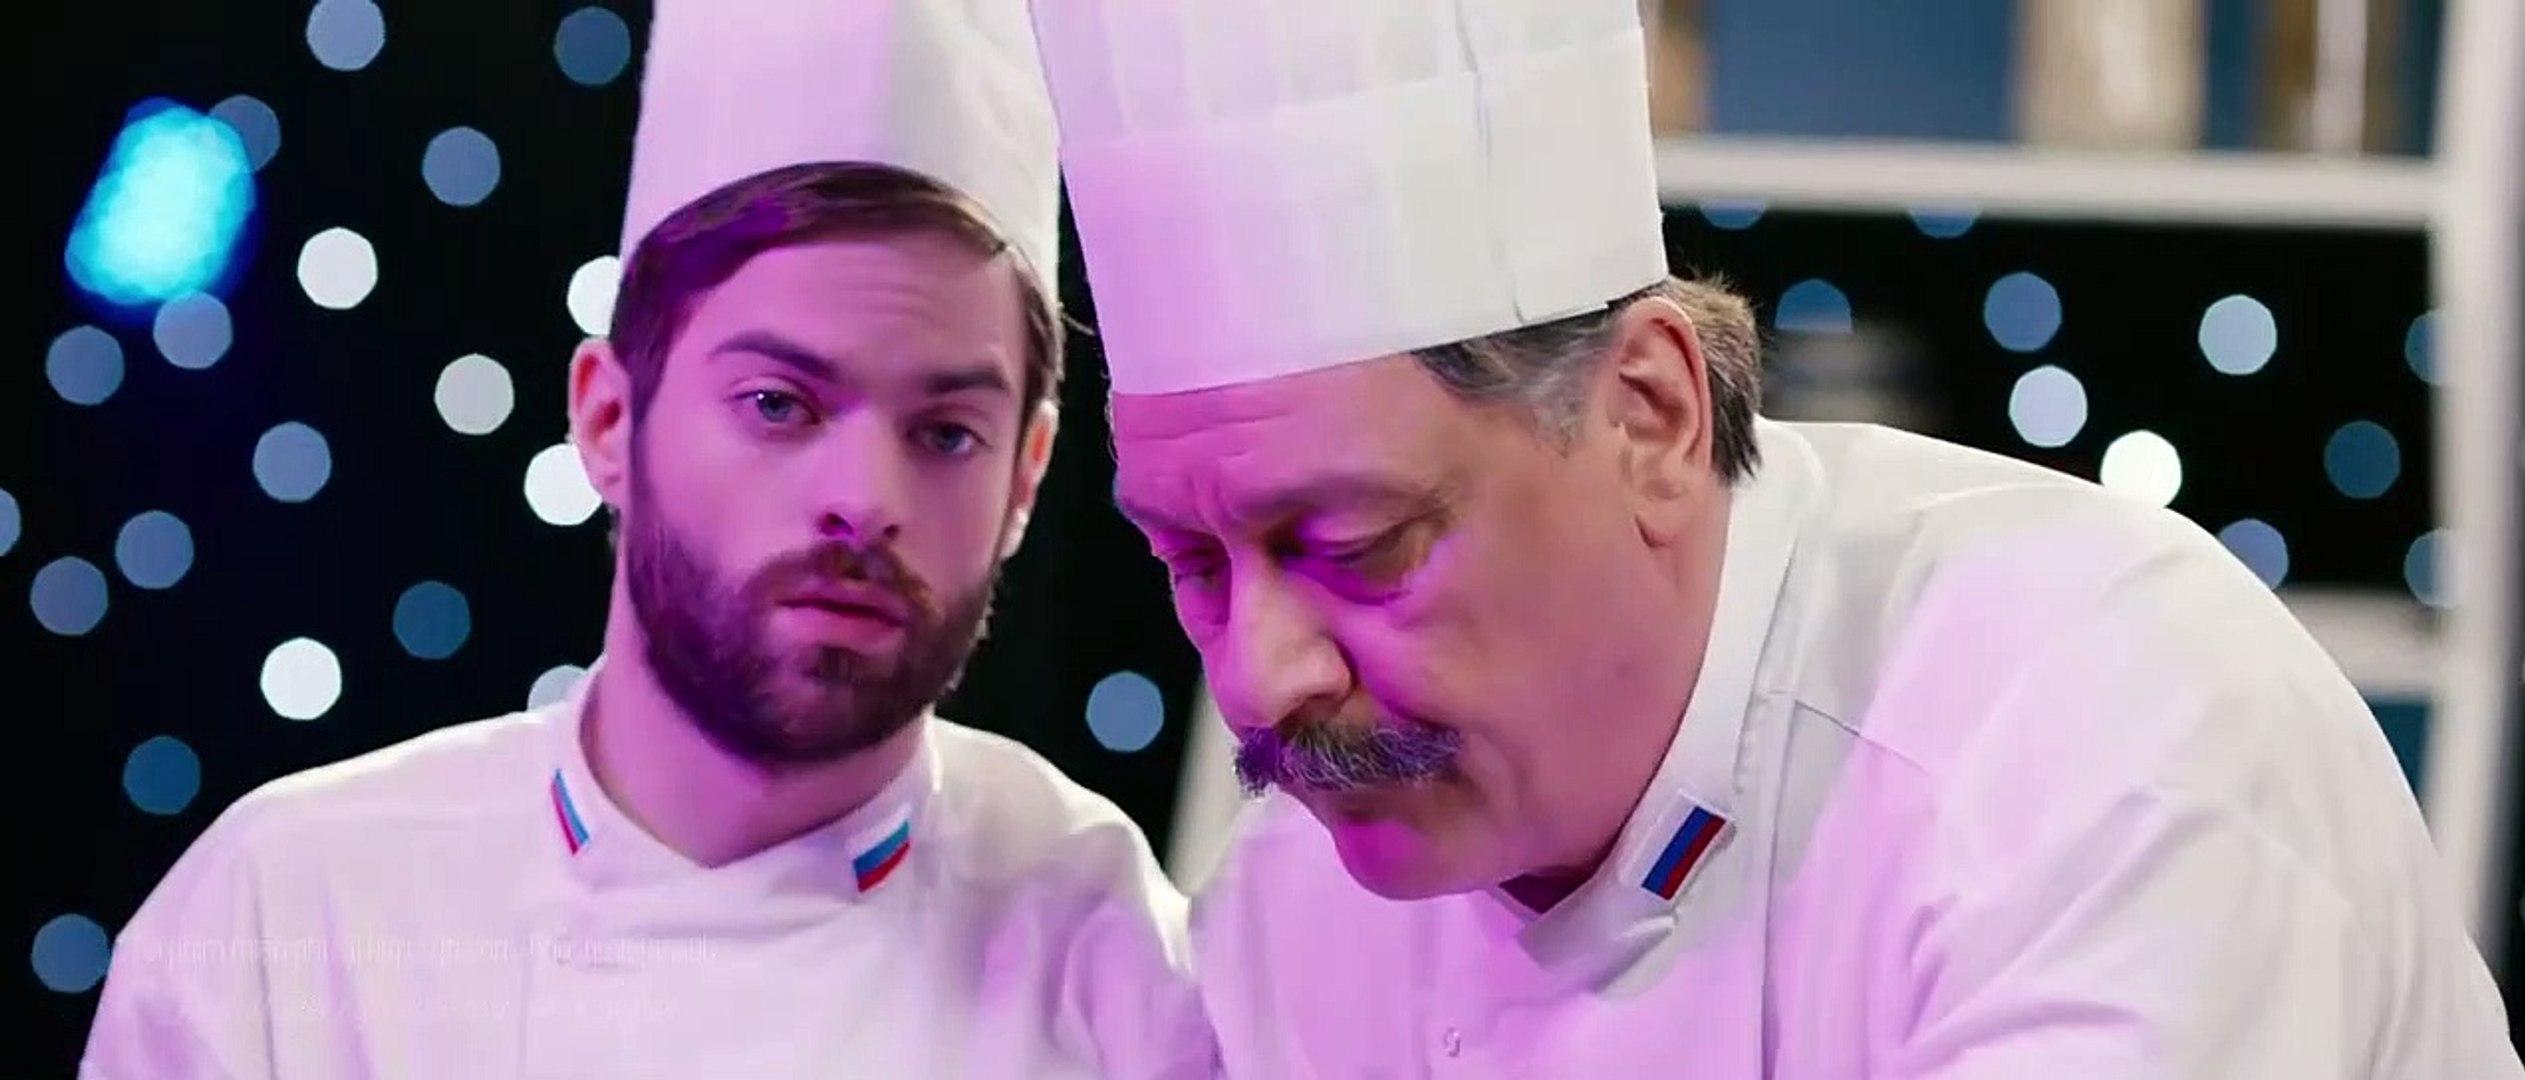 Kitchen - Cuộc chiến cuối cùng p4 (The last battle) (Кухня. Последняя битва)(2017)